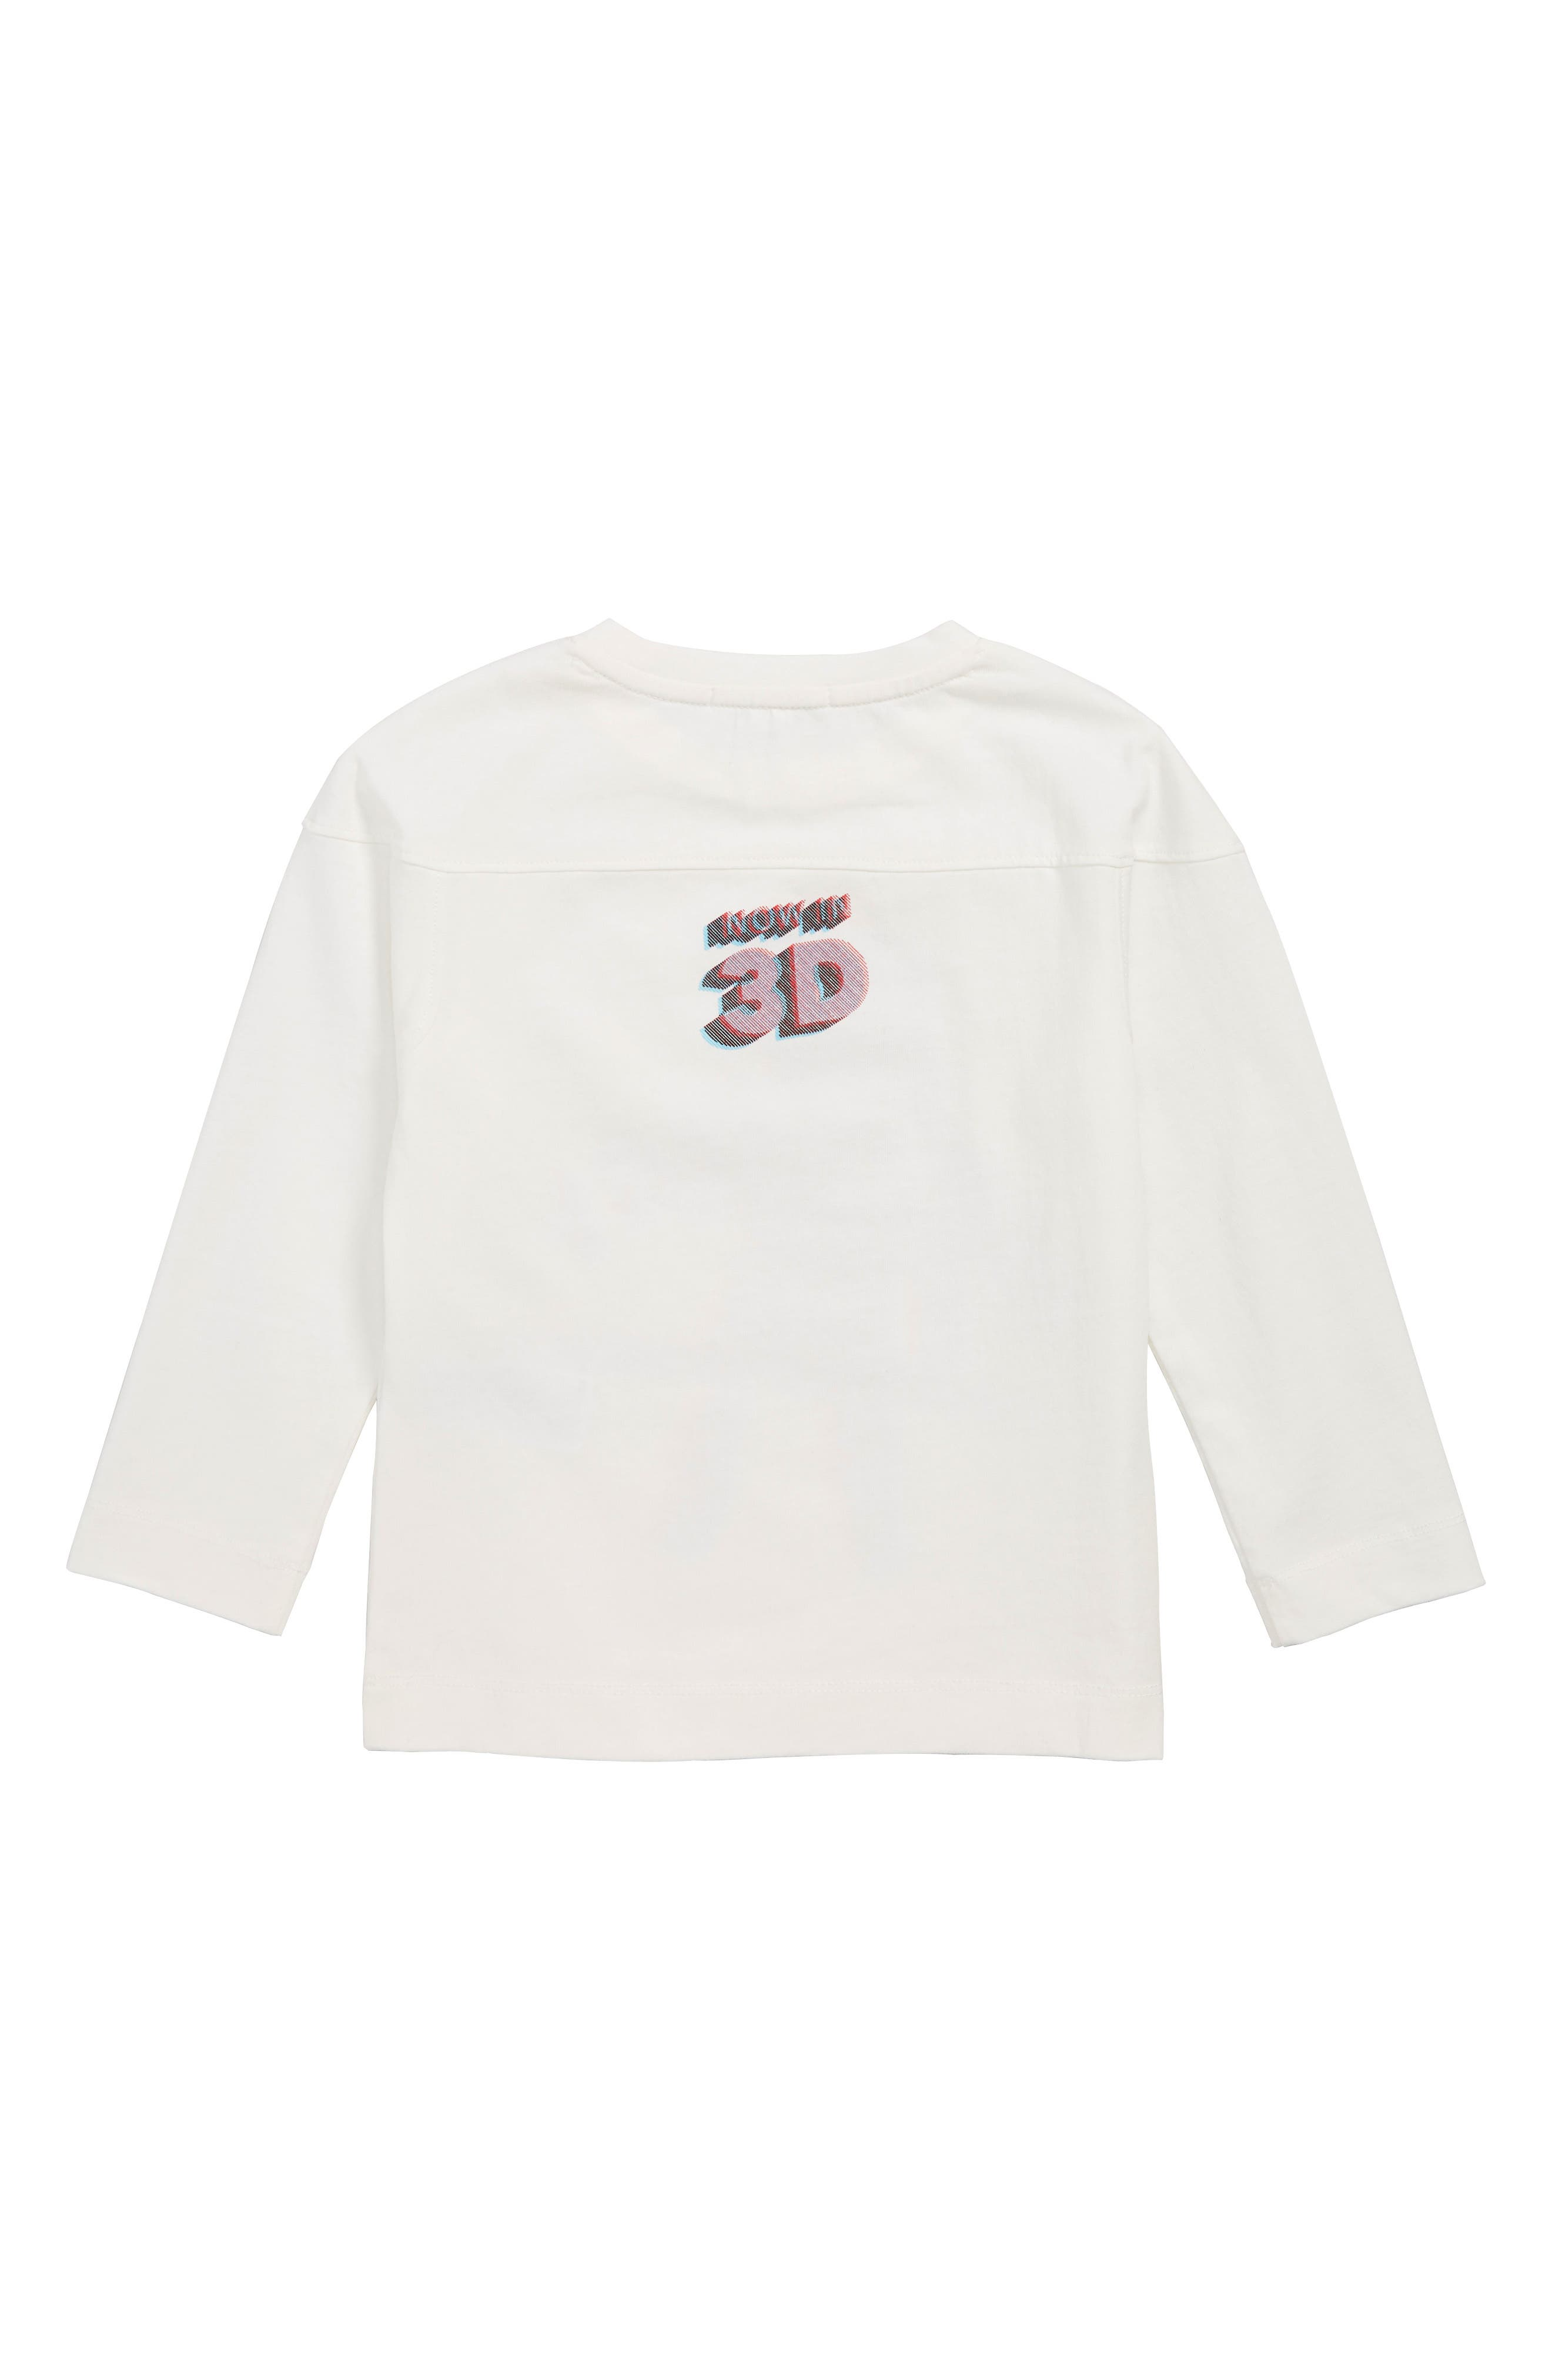 BURBERRY,                             3D Spaceman Graphic T-Shirt,                             Alternate thumbnail 2, color,                             100